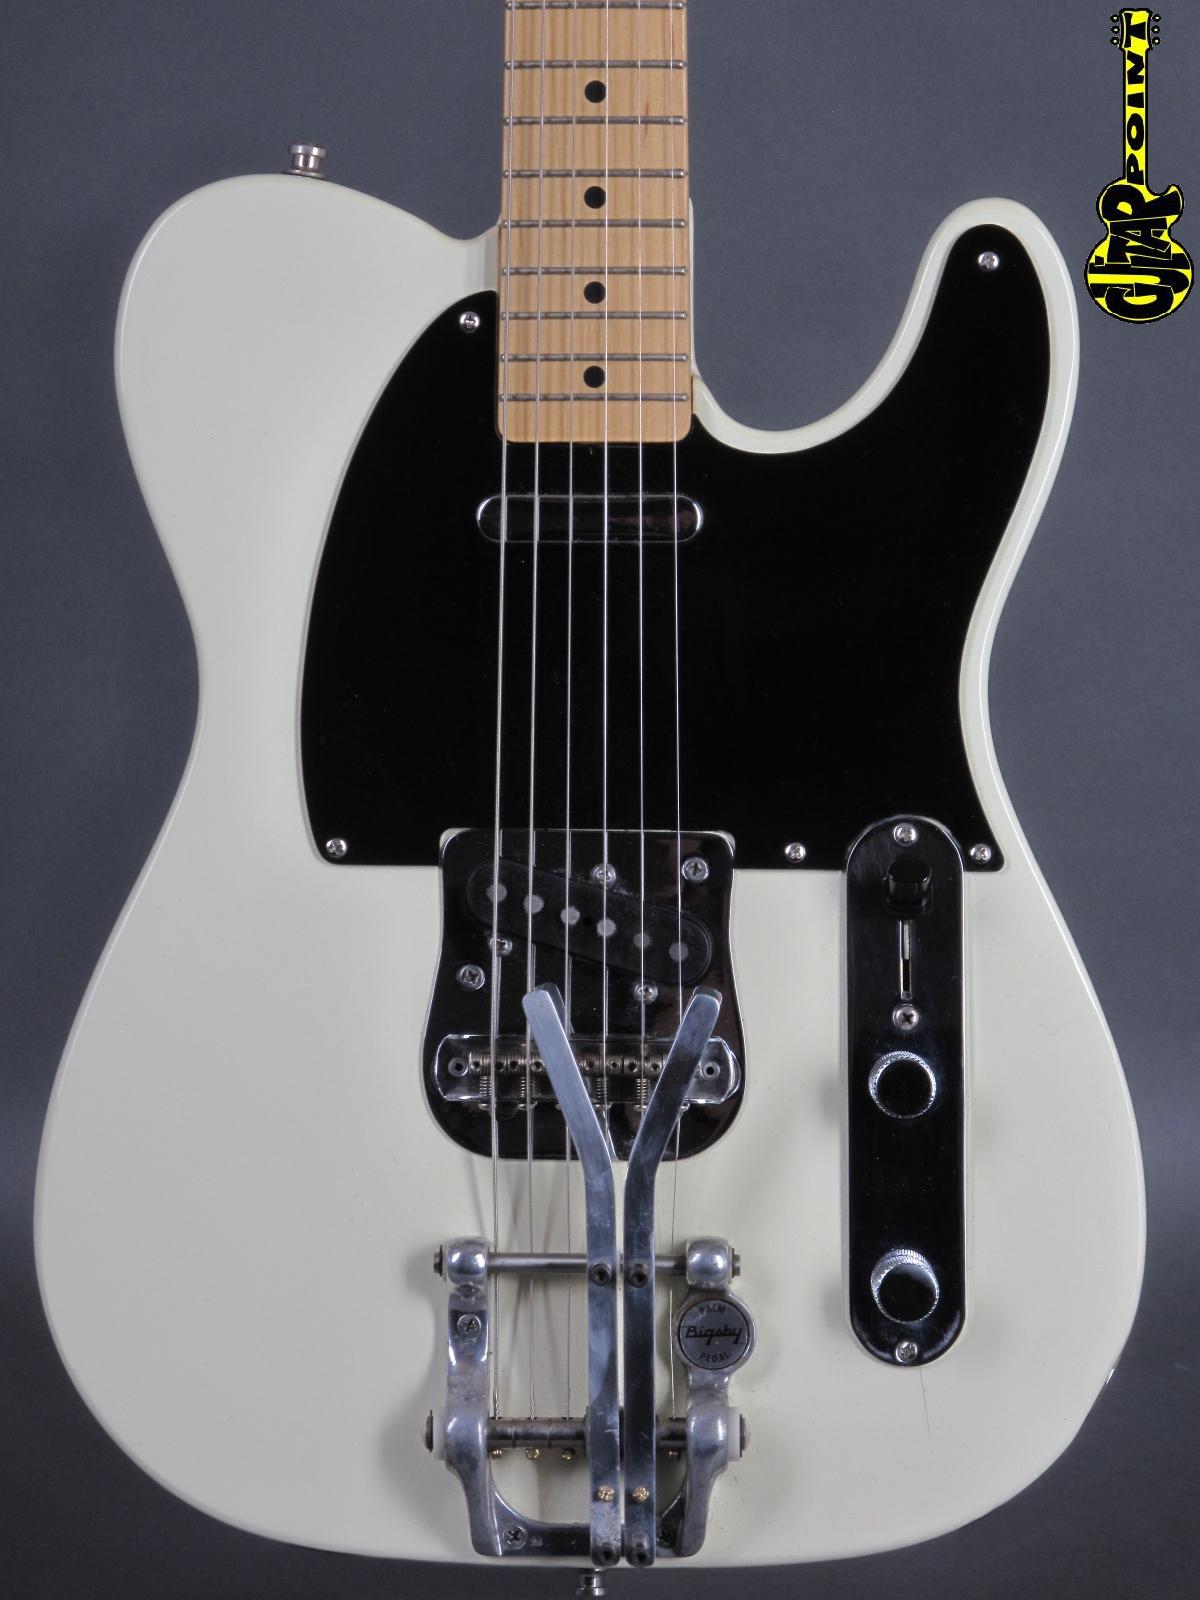 1989 Fender Telecaster - White / Bigsby Palm Bender